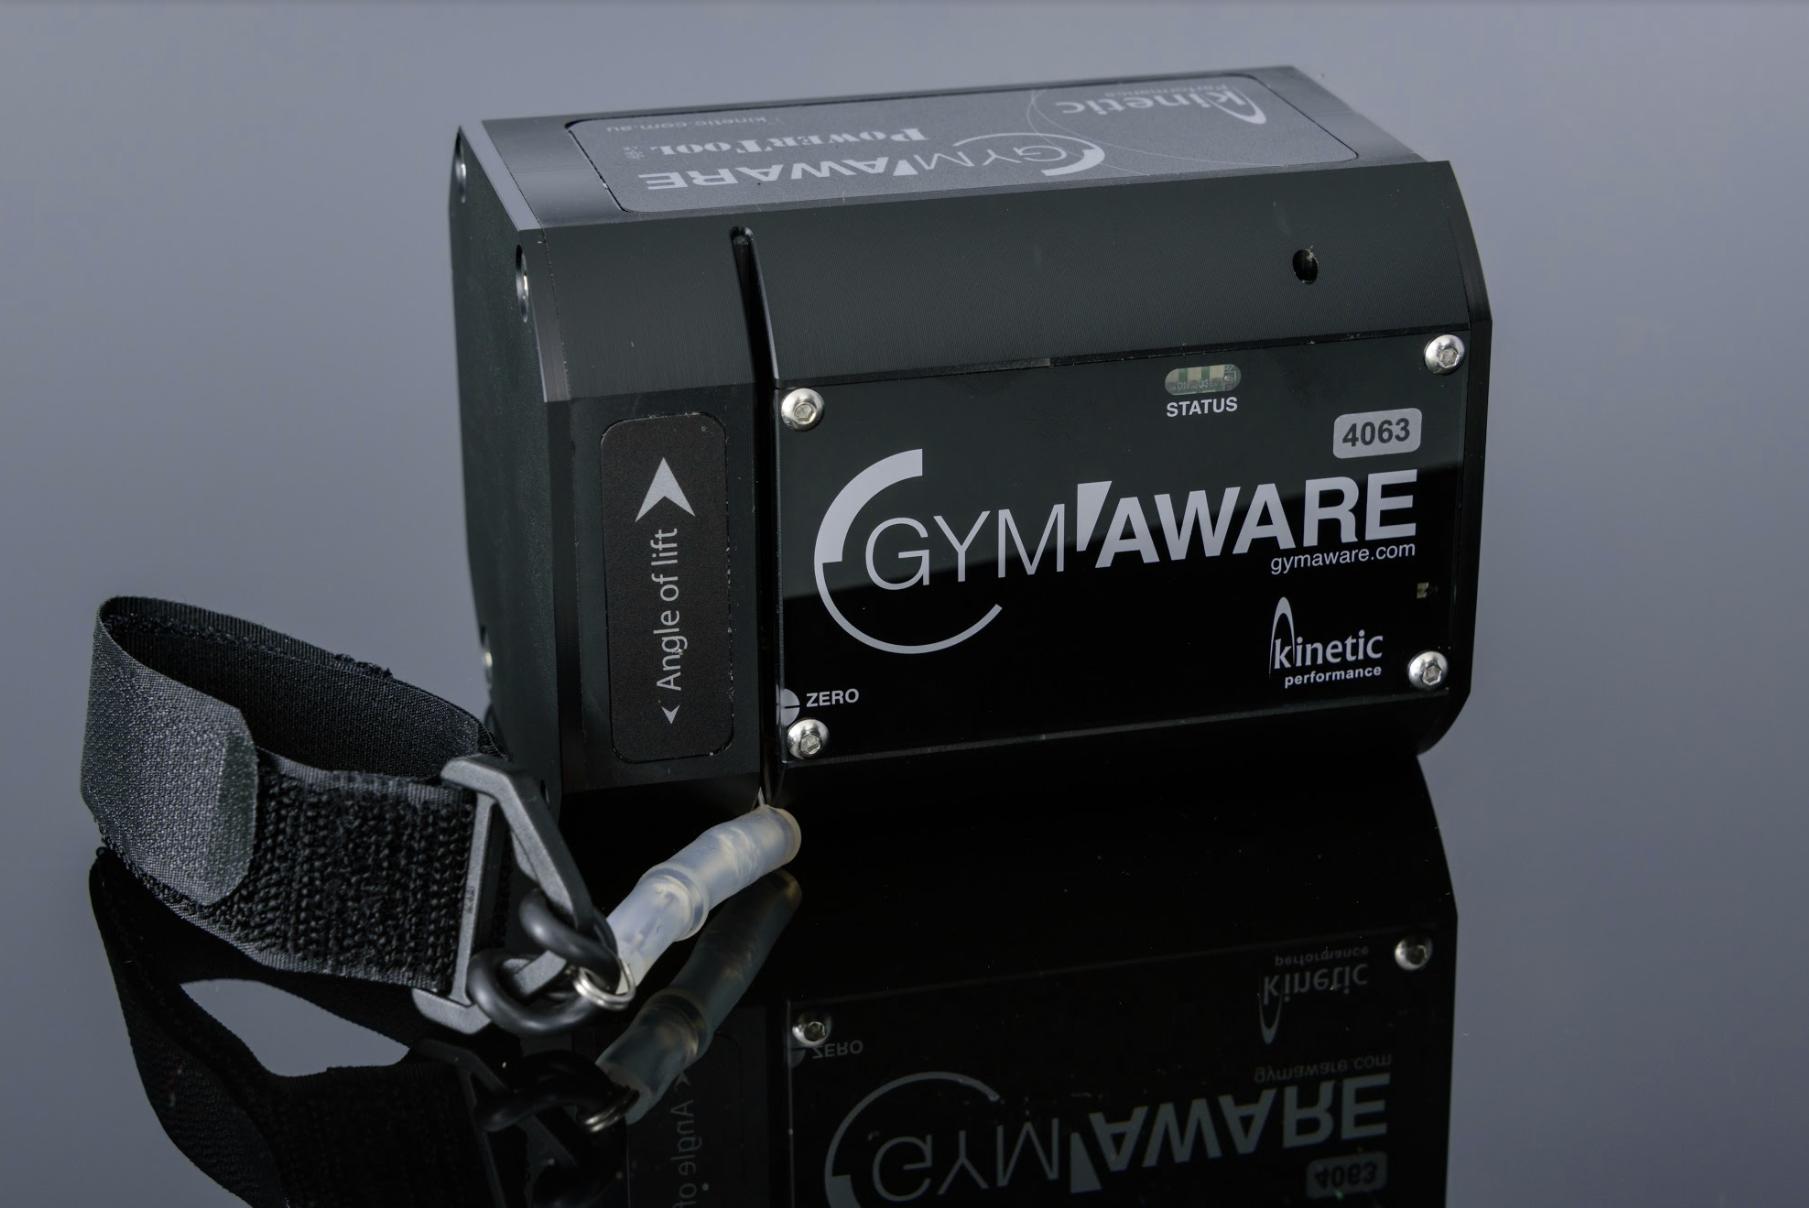 GYMAWARE VS CAMERA BASED SYSTEMS